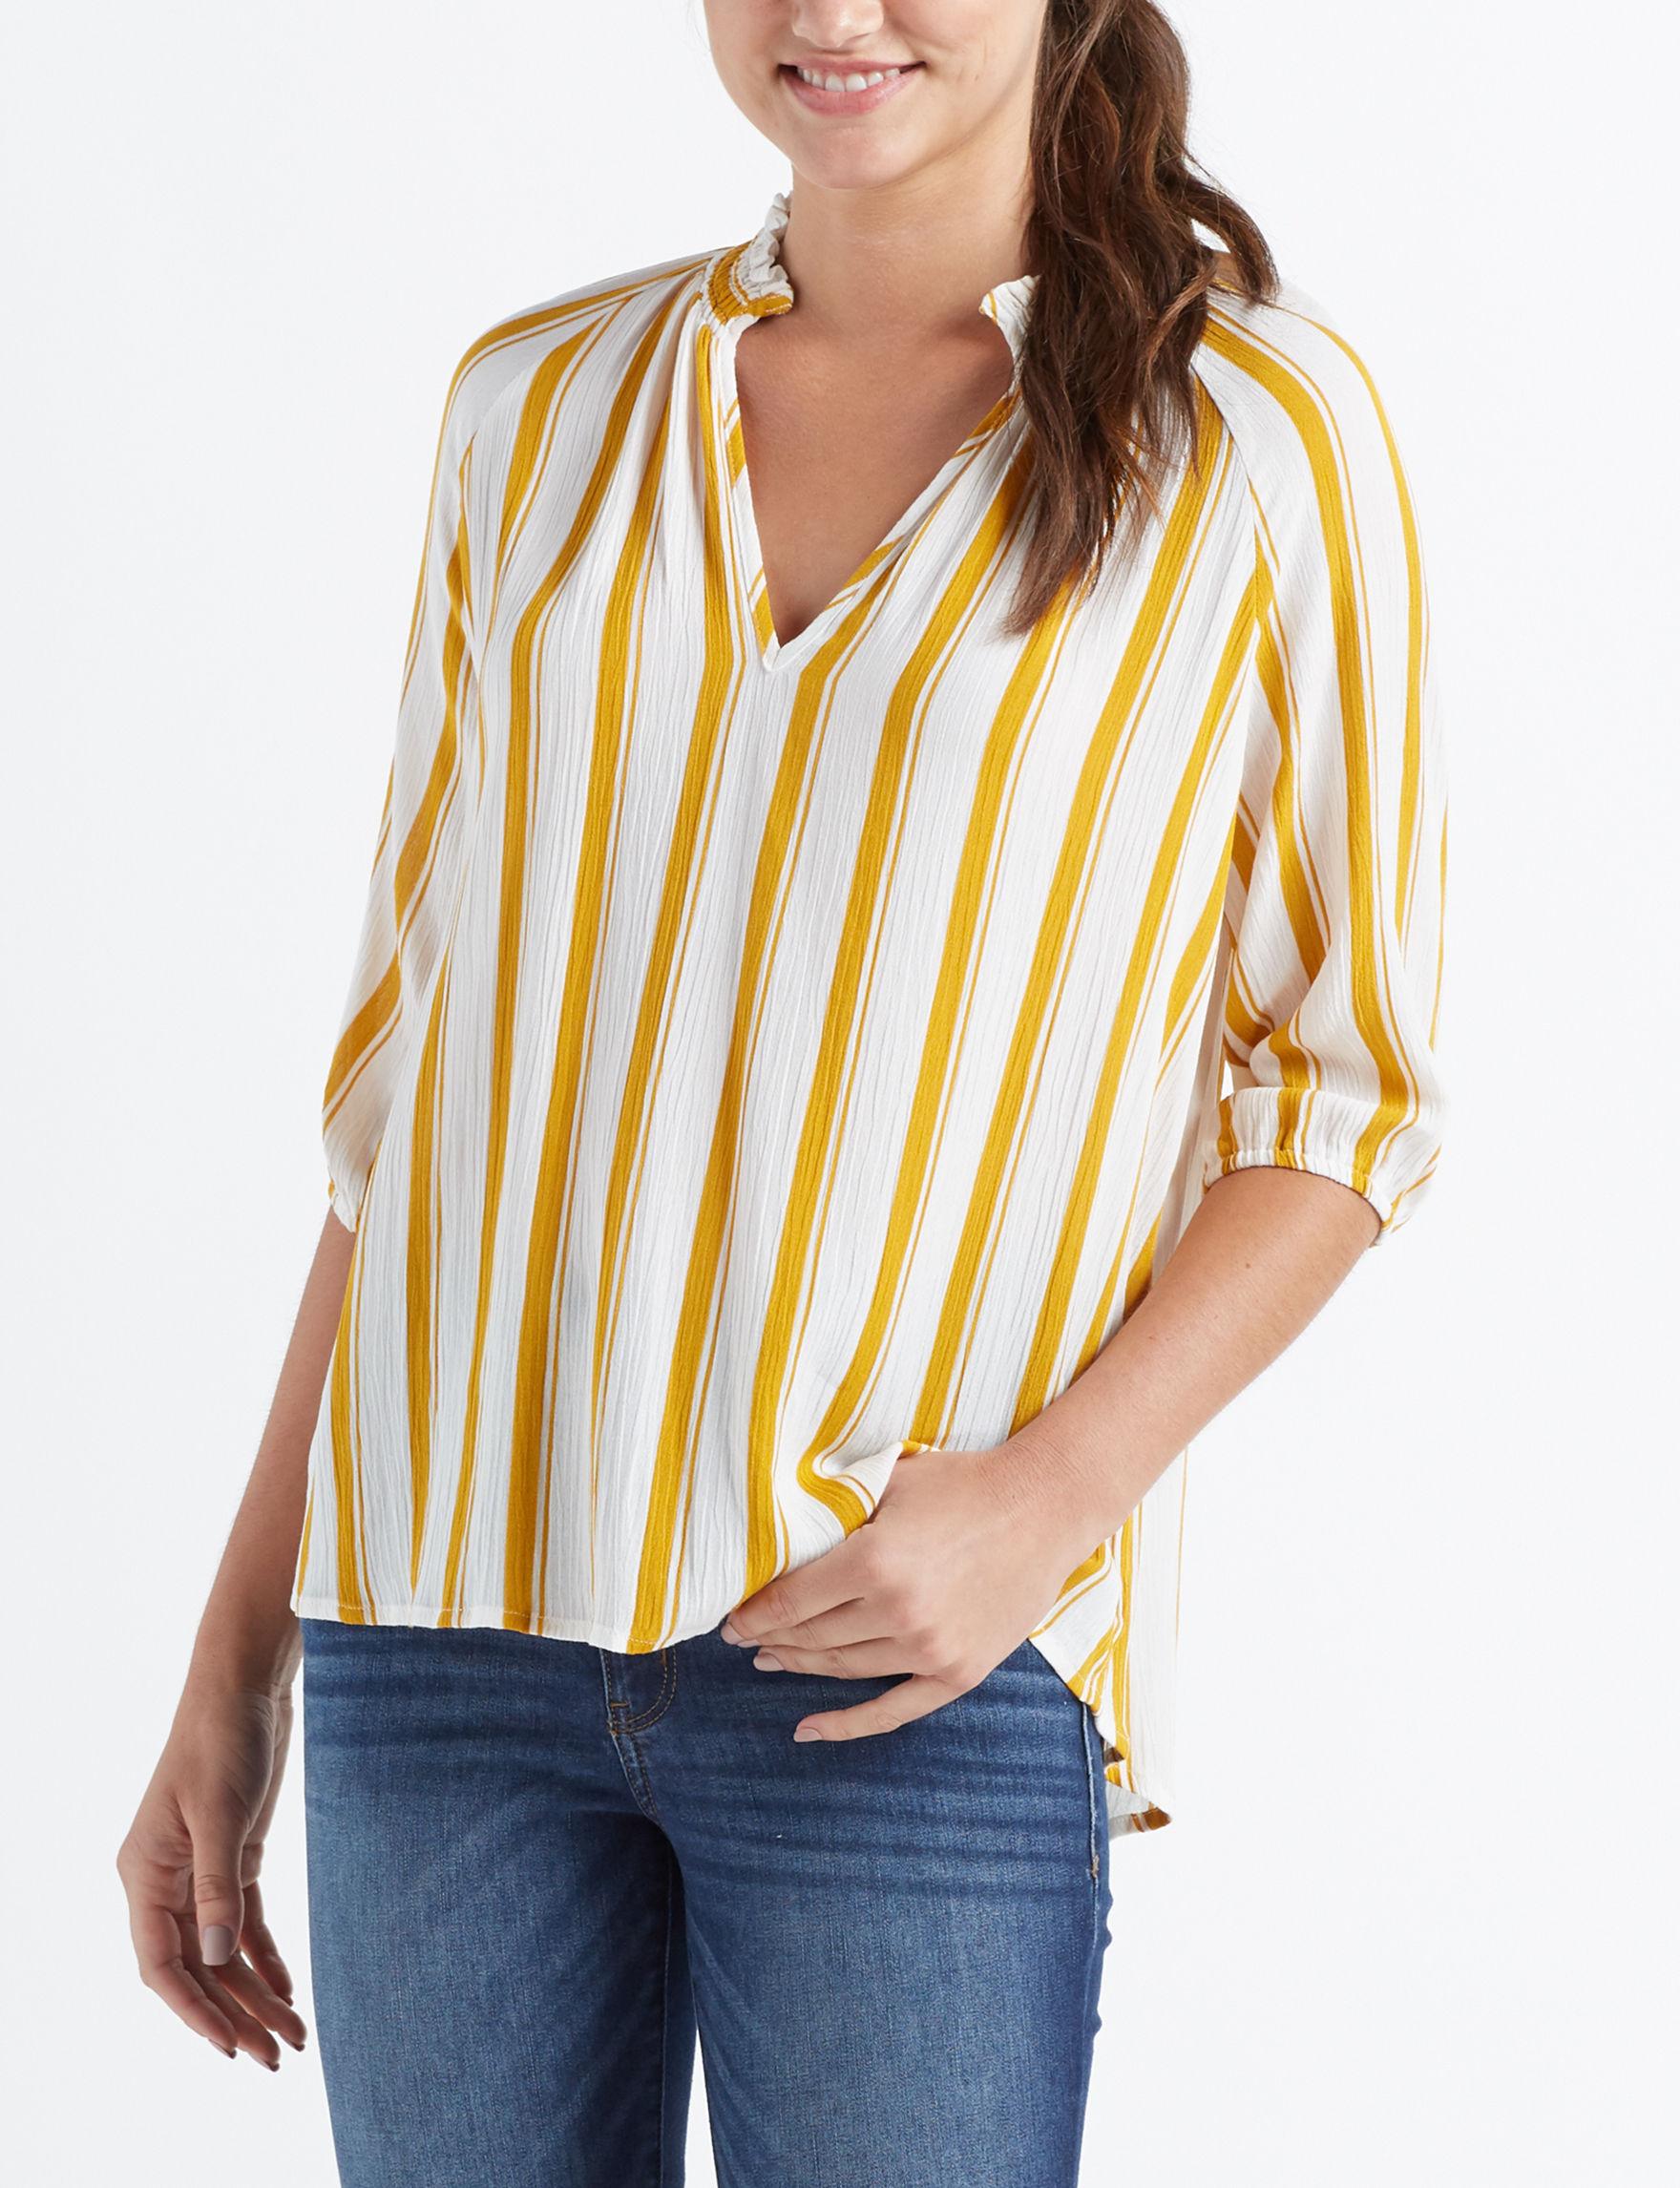 Liberty Love Mustard Shirts & Blouses